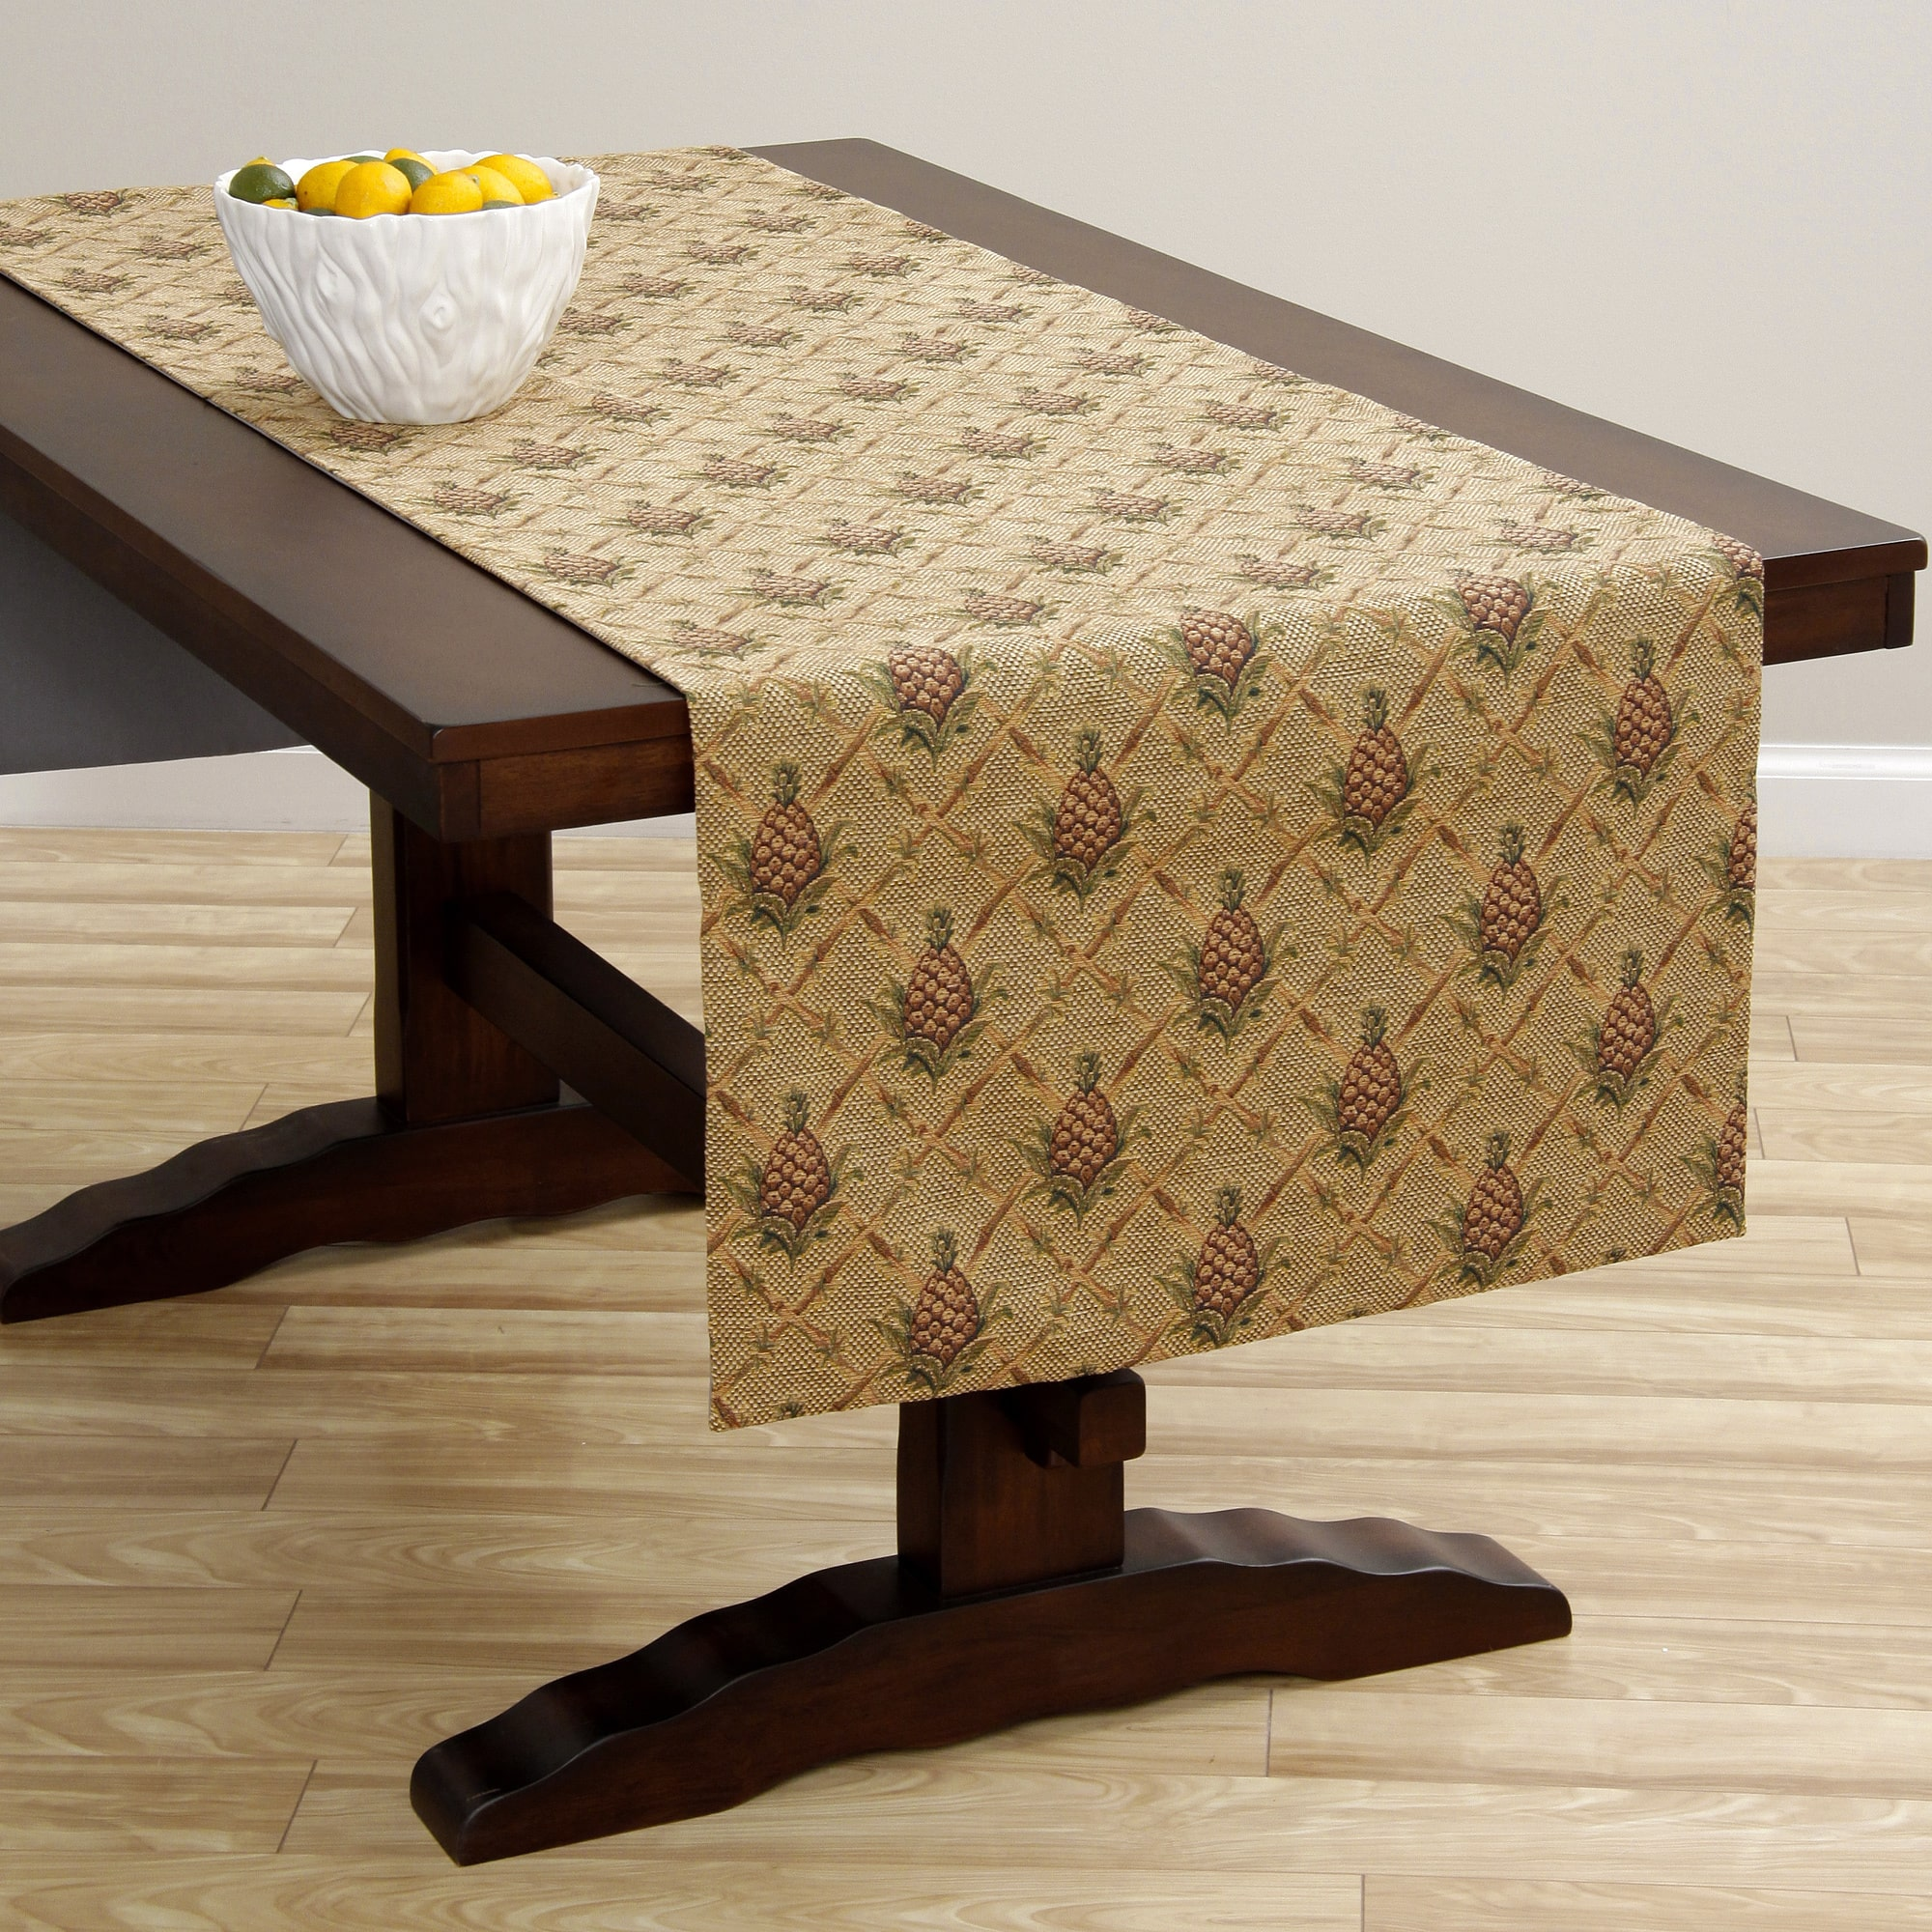 Corona Decor  Extra Wide Italian Woven 95 x 26-inch Table...